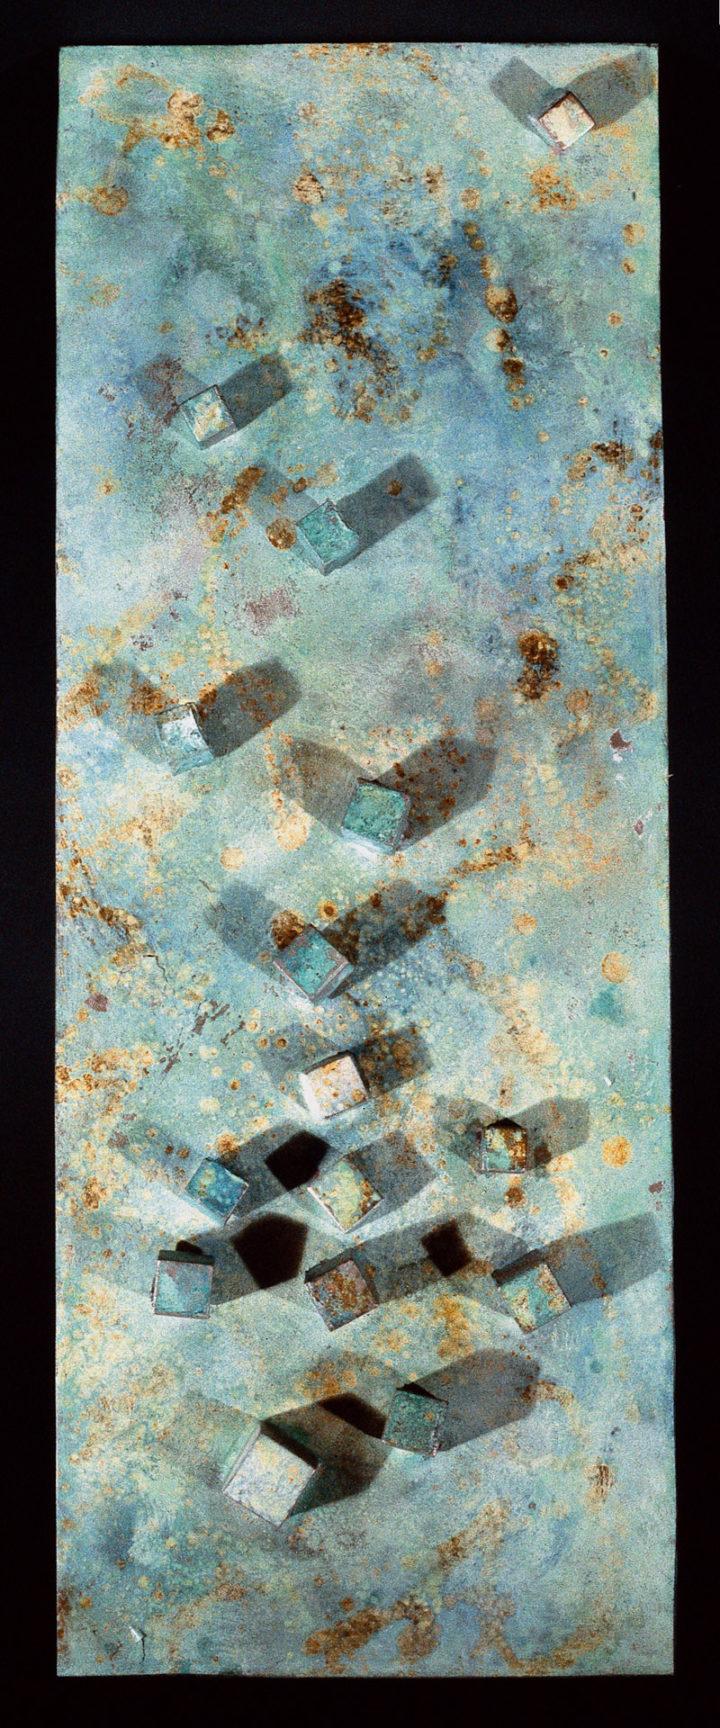 Environmental, or Tumbling Cubes